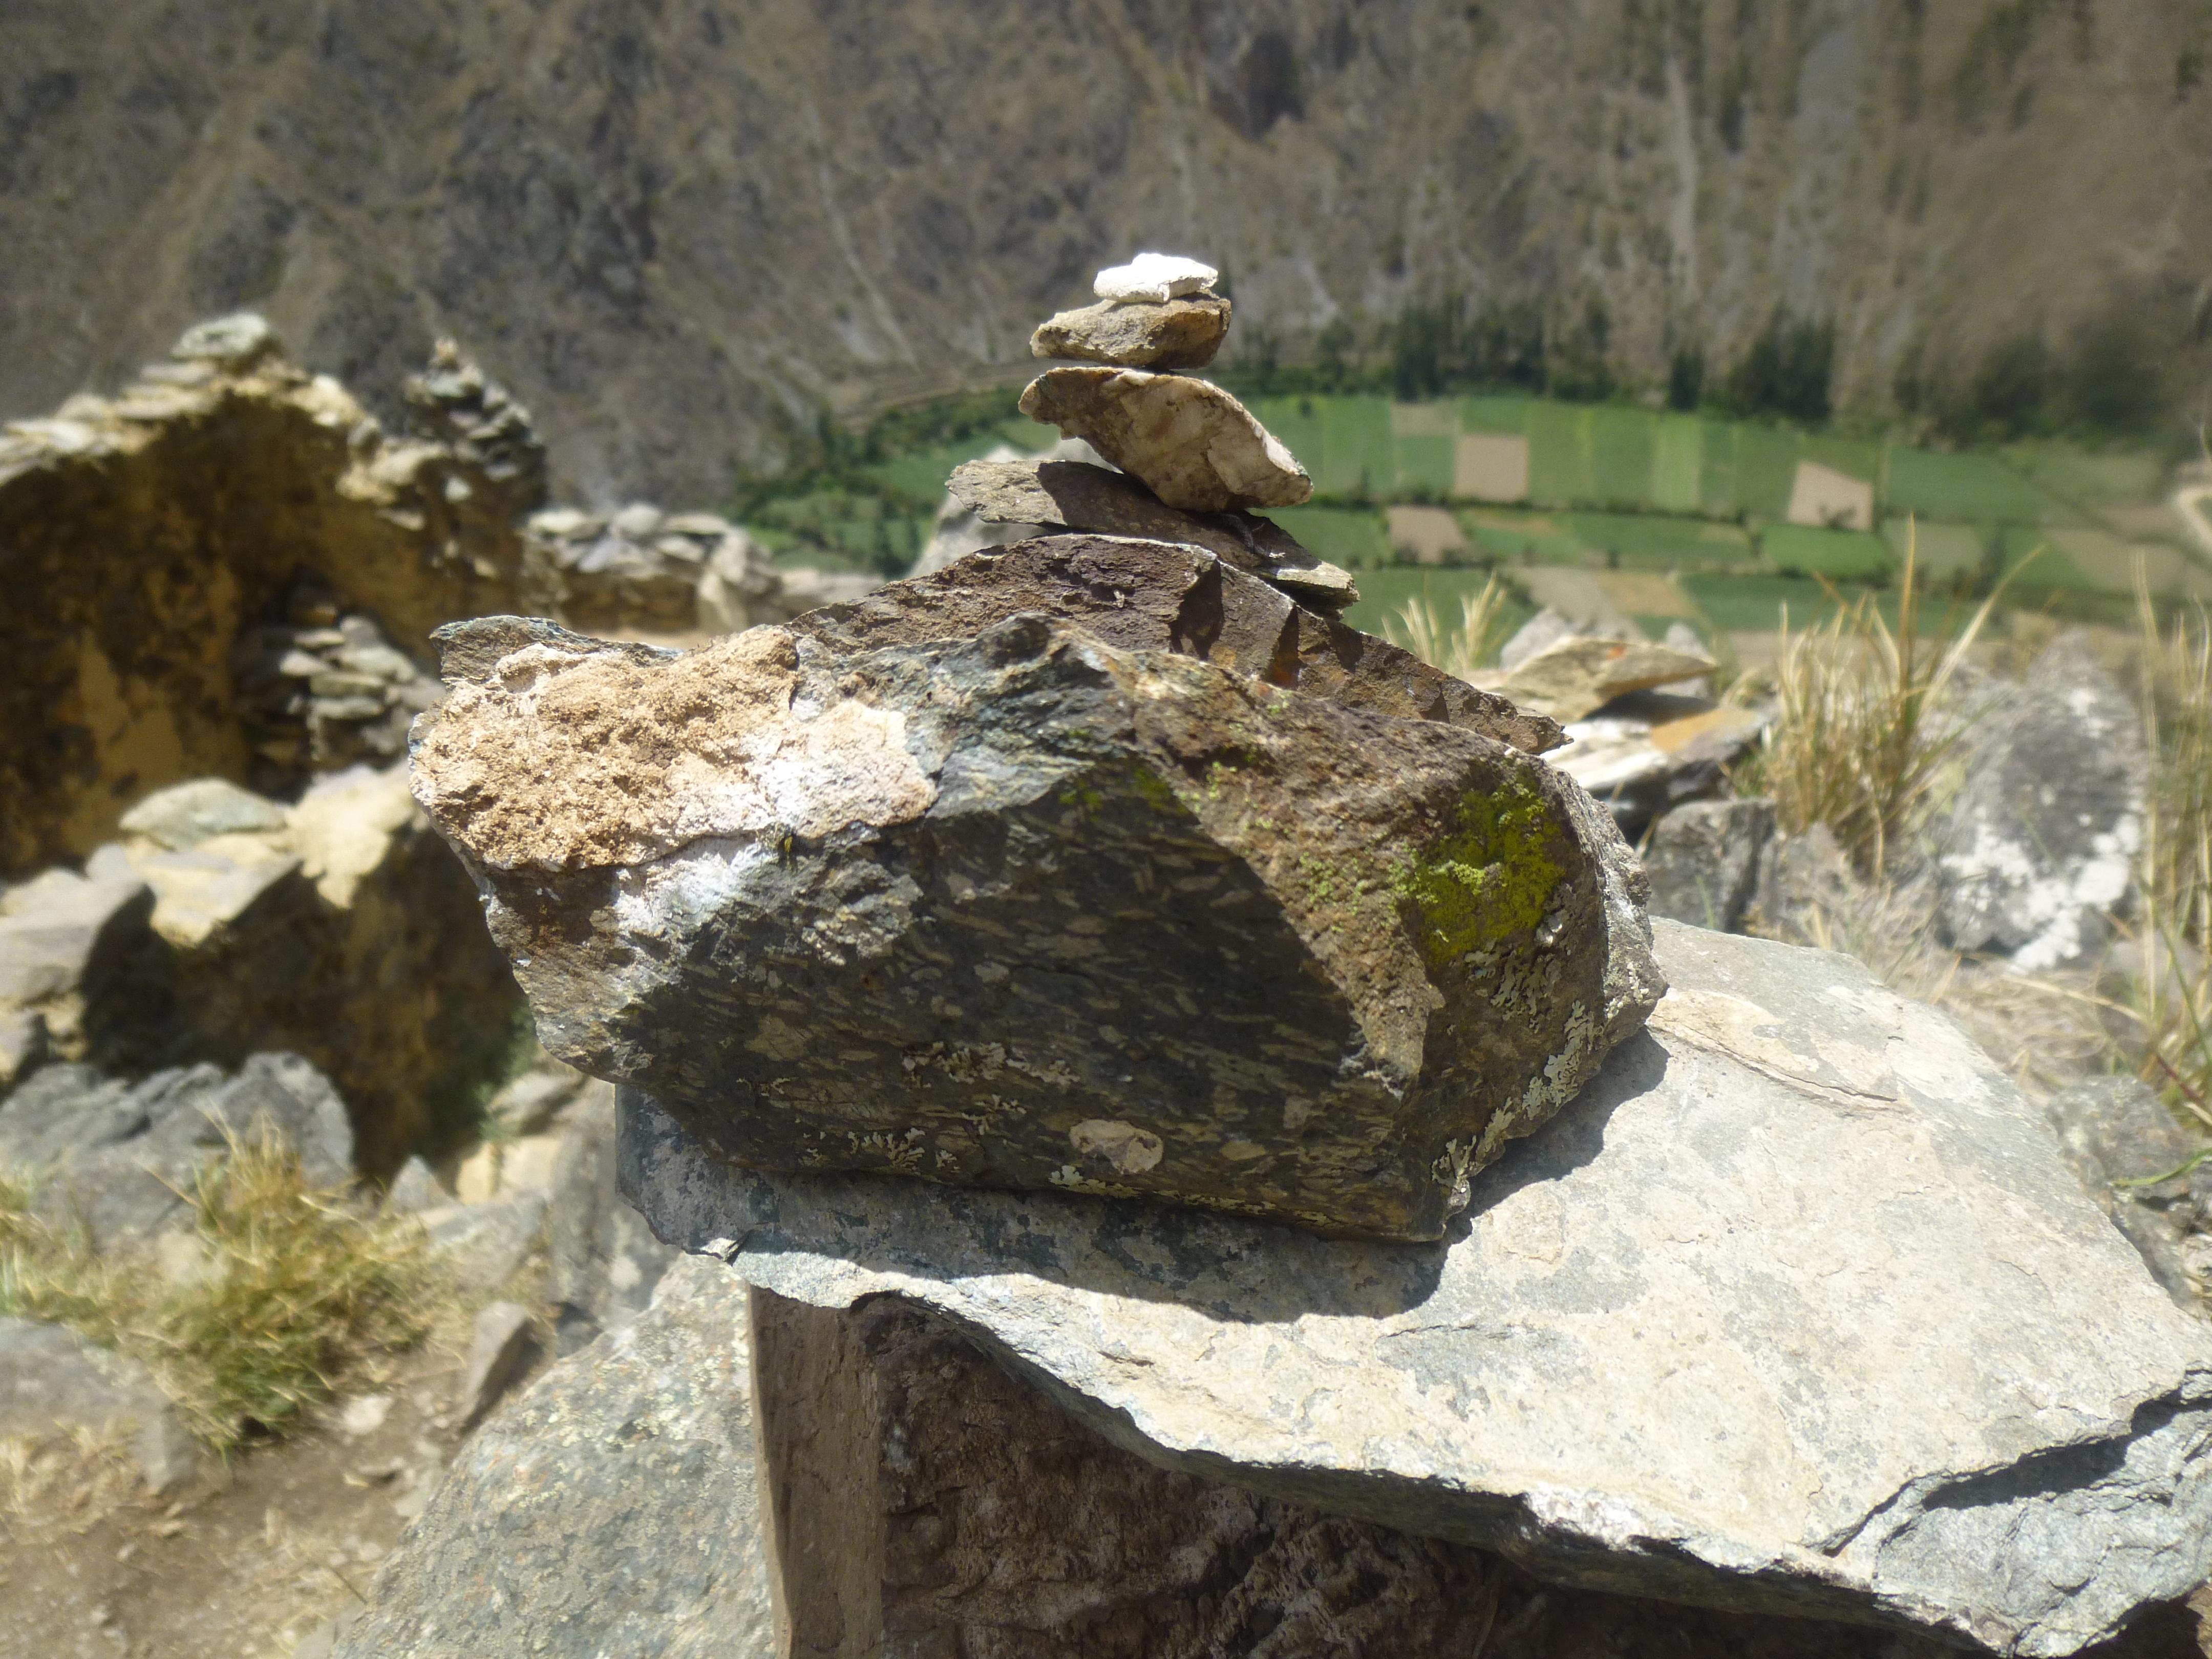 P1030970 - Local's Guide to Ollantaytambo, Peru